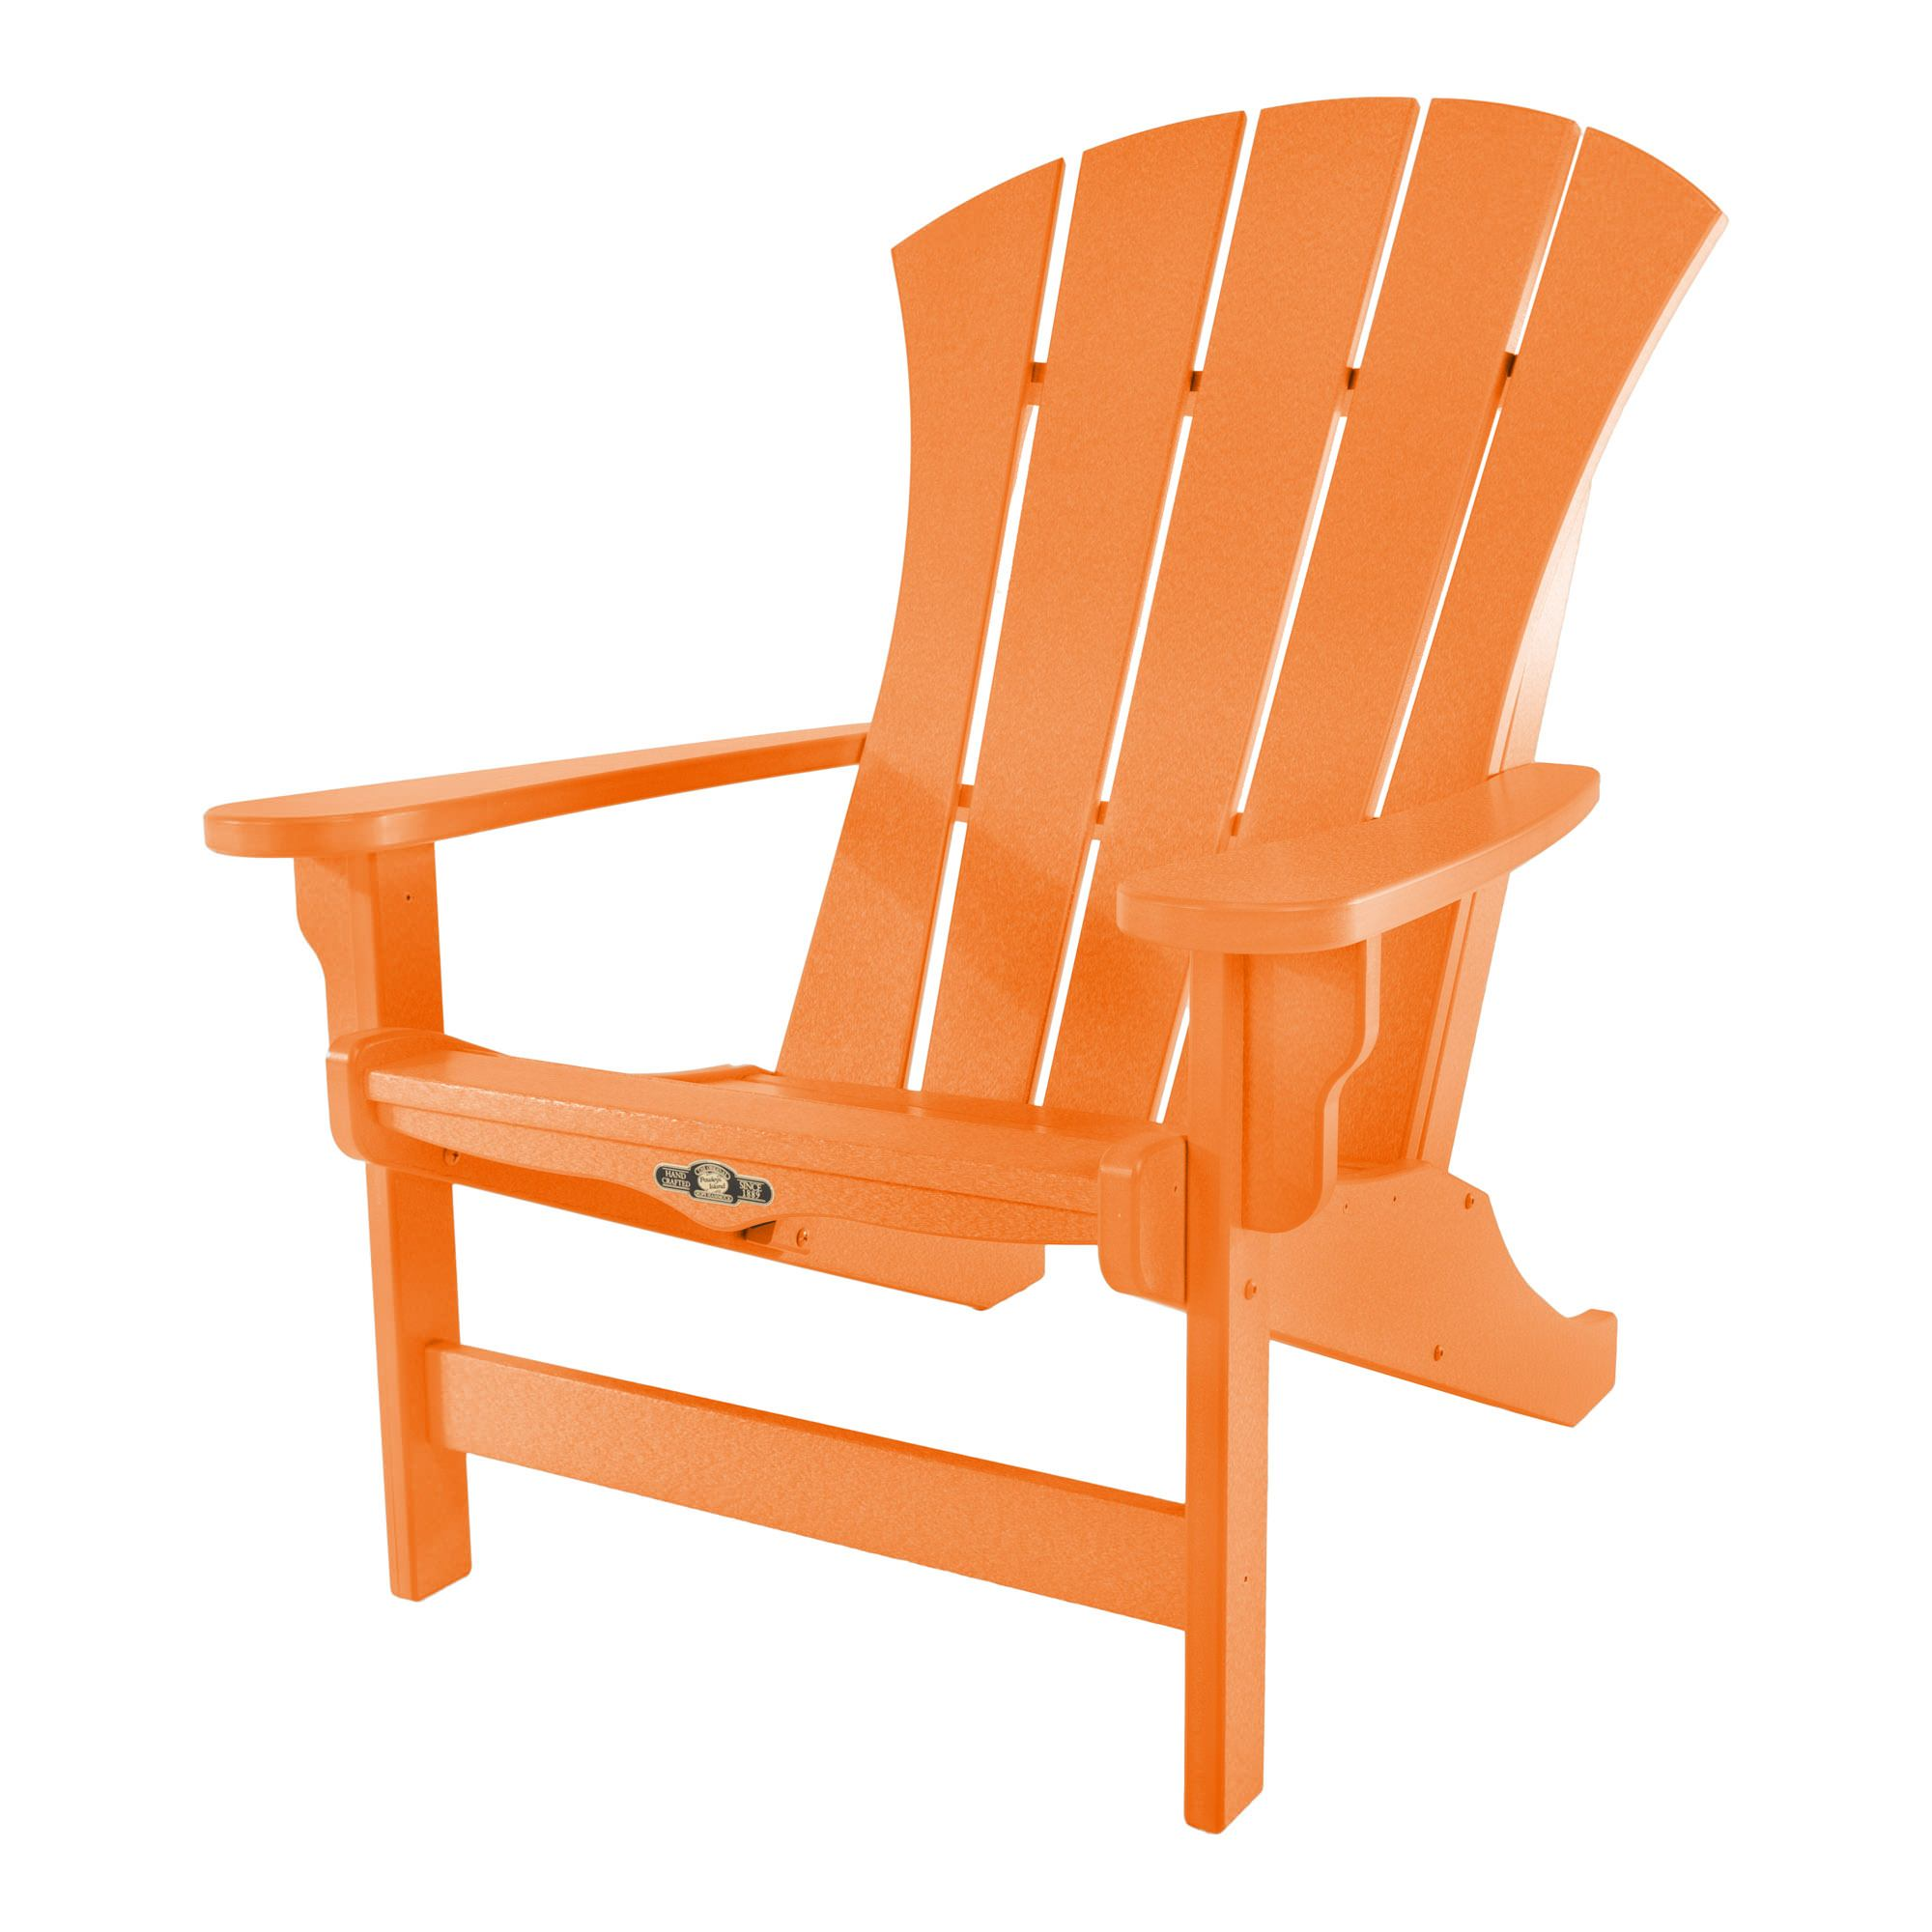 Picture of: Durawood Sunrise Adirondack Chair Pawleys Island Hammocks